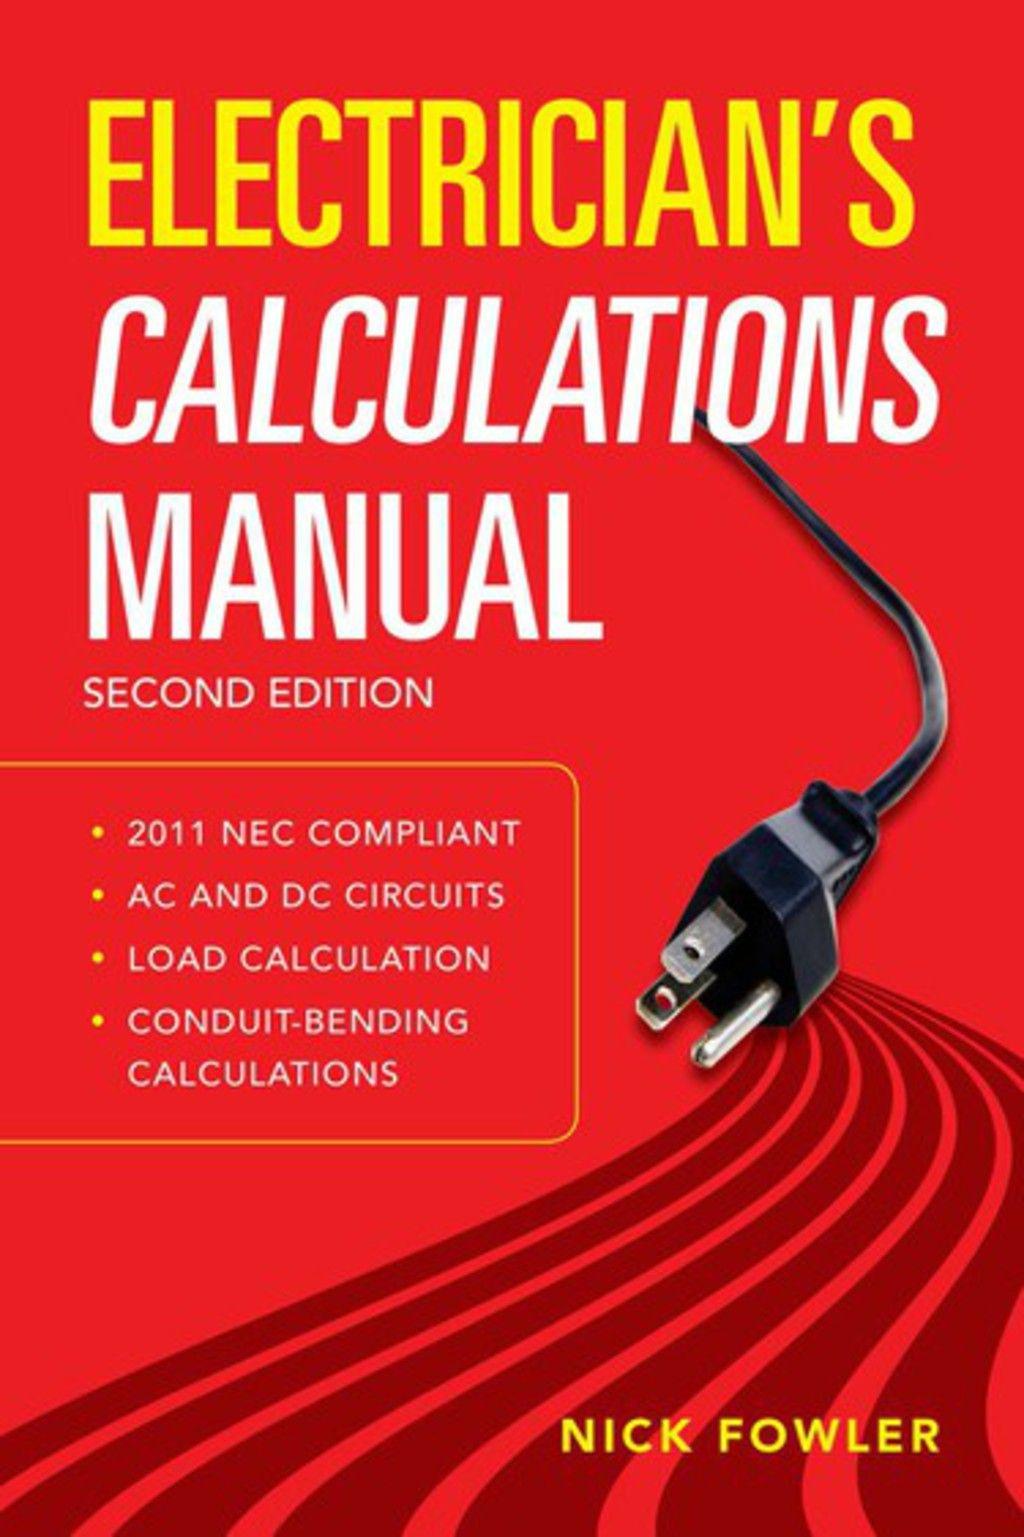 Electrician S Calculations Manual Second Edition Ebook